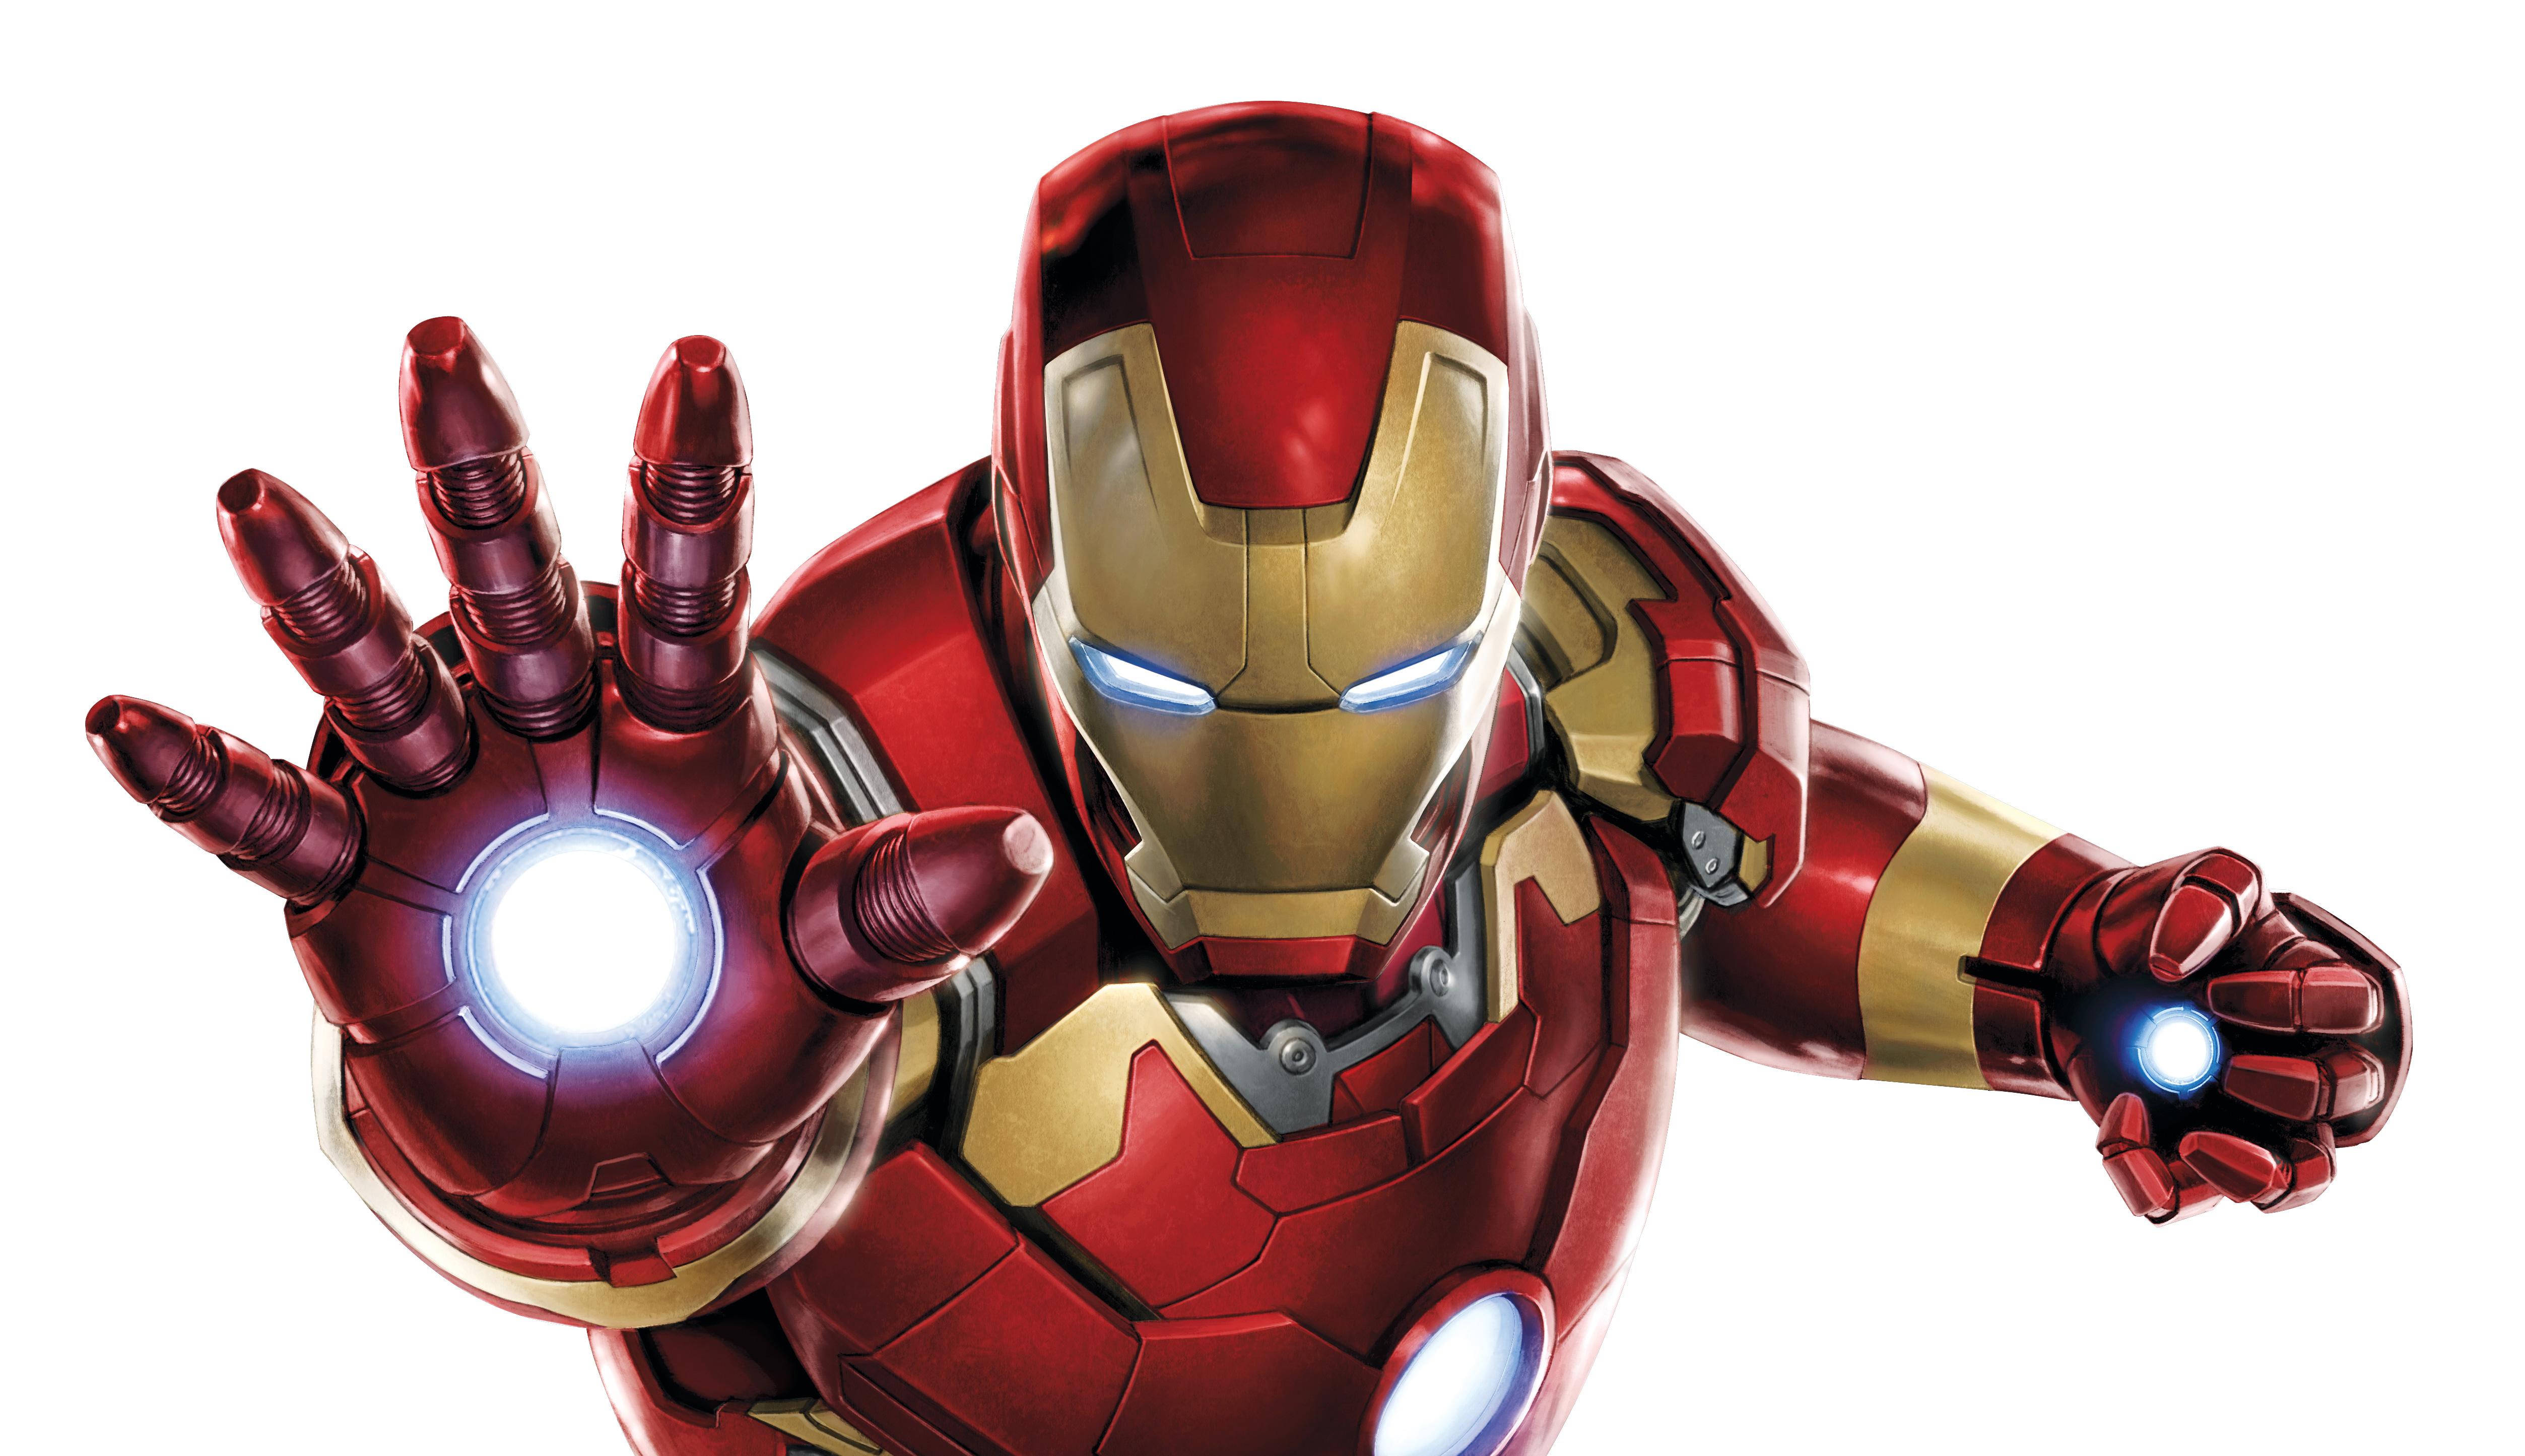 Iron man 5k hd movies 4k wallpapers images backgrounds - Iron man cartoon hd ...